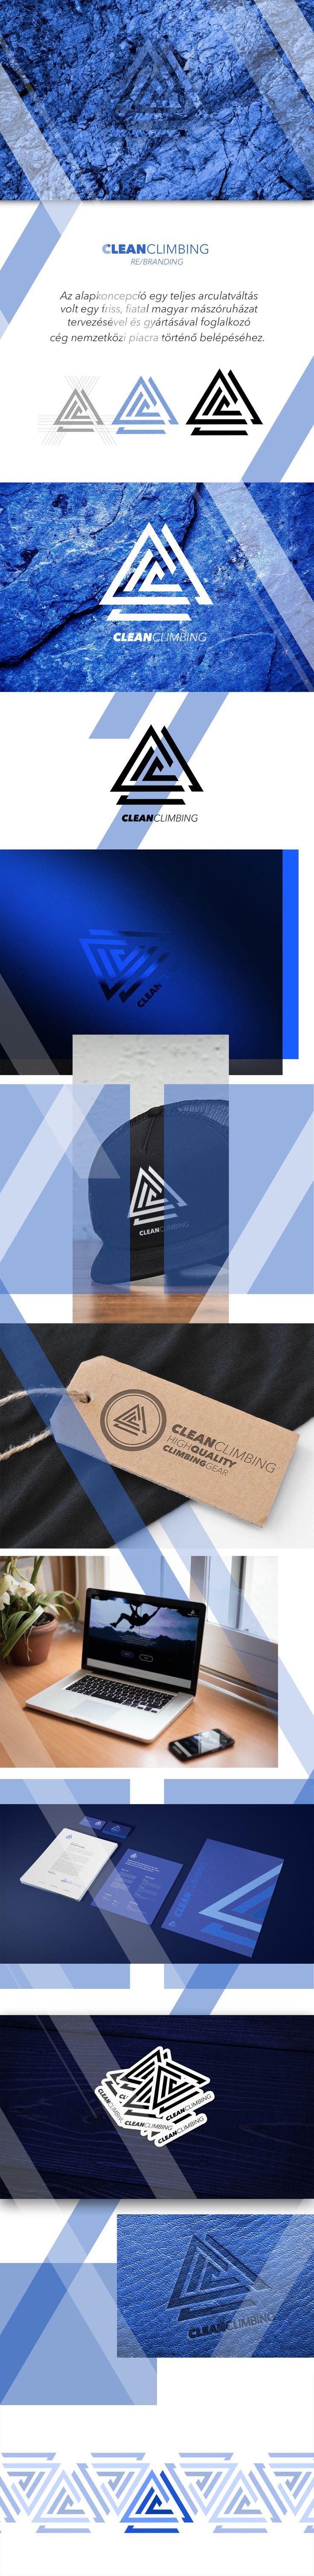 CLEAN CLIMBING ReBranding - Alternate version https://www.behance.net/gallery/47096931/CLEAN-CLIMBING-ReBranding-Alternate-version #branding